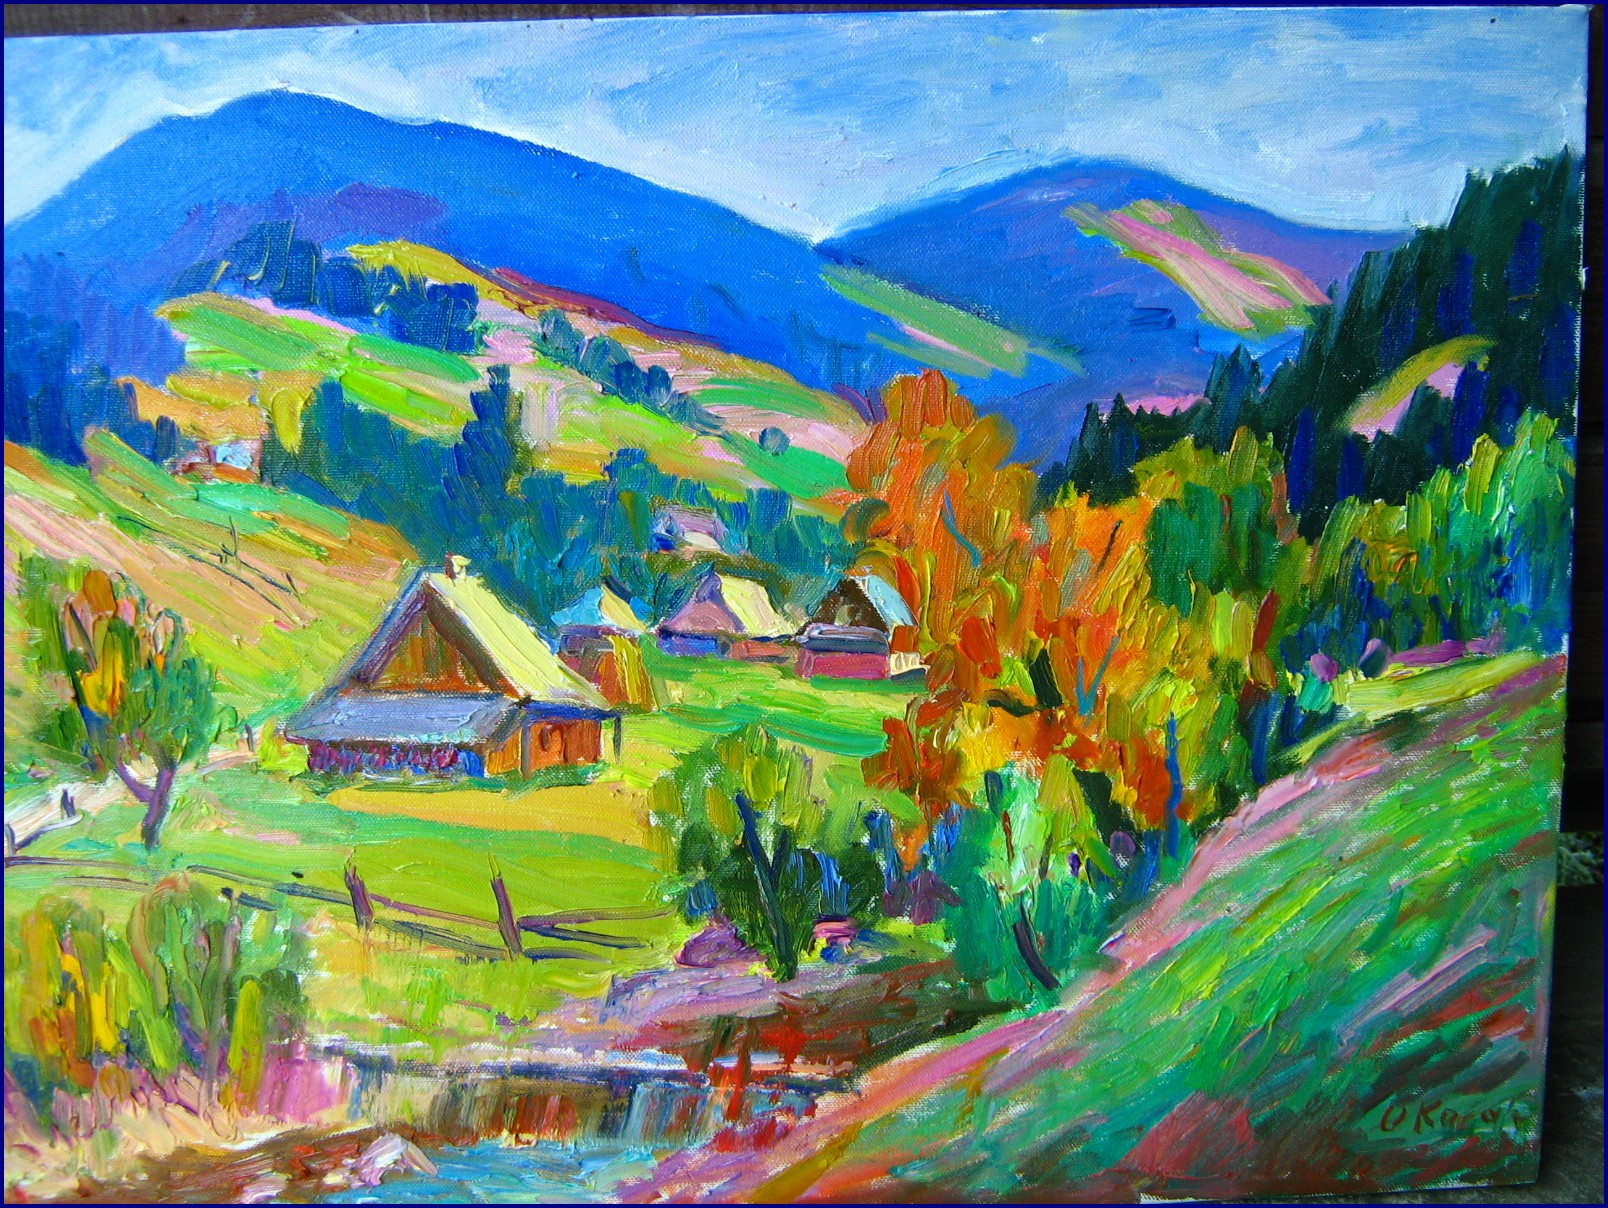 1310917240_selo-zdovzh-rki-1600x1200_www.nevsepic.com.ua